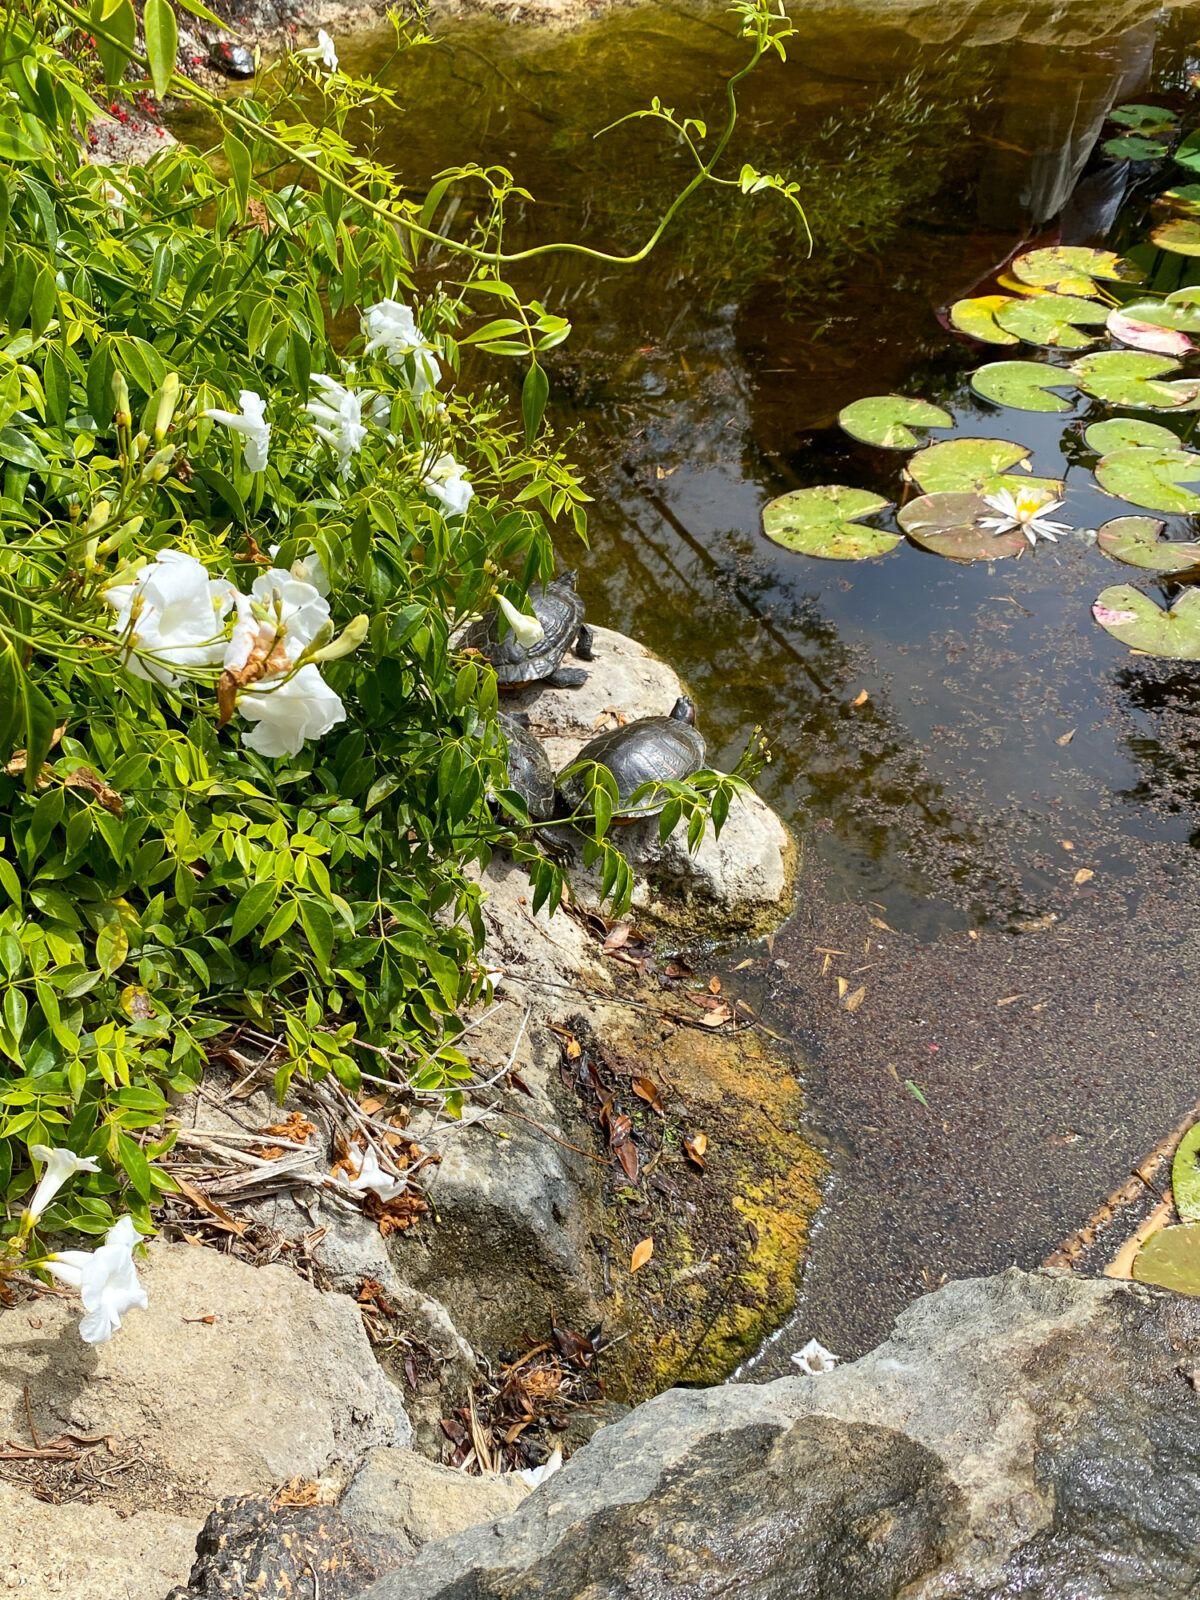 Turtles sunning themselves at the San Diego Botanic Garden Bamboo Pond